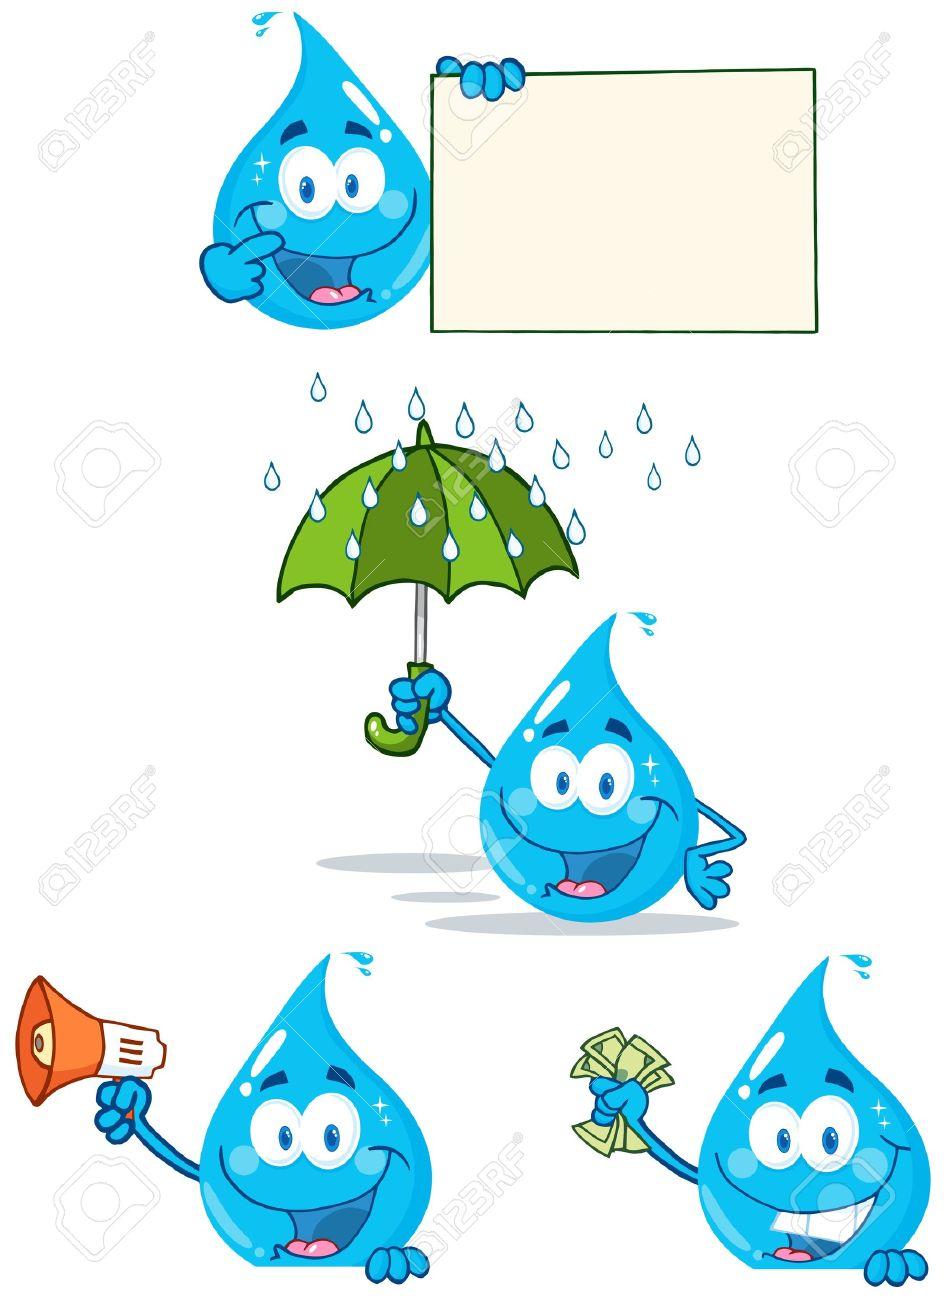 Water Drop Cartoon Mascot Characters 3 Stock Vector - 14622645